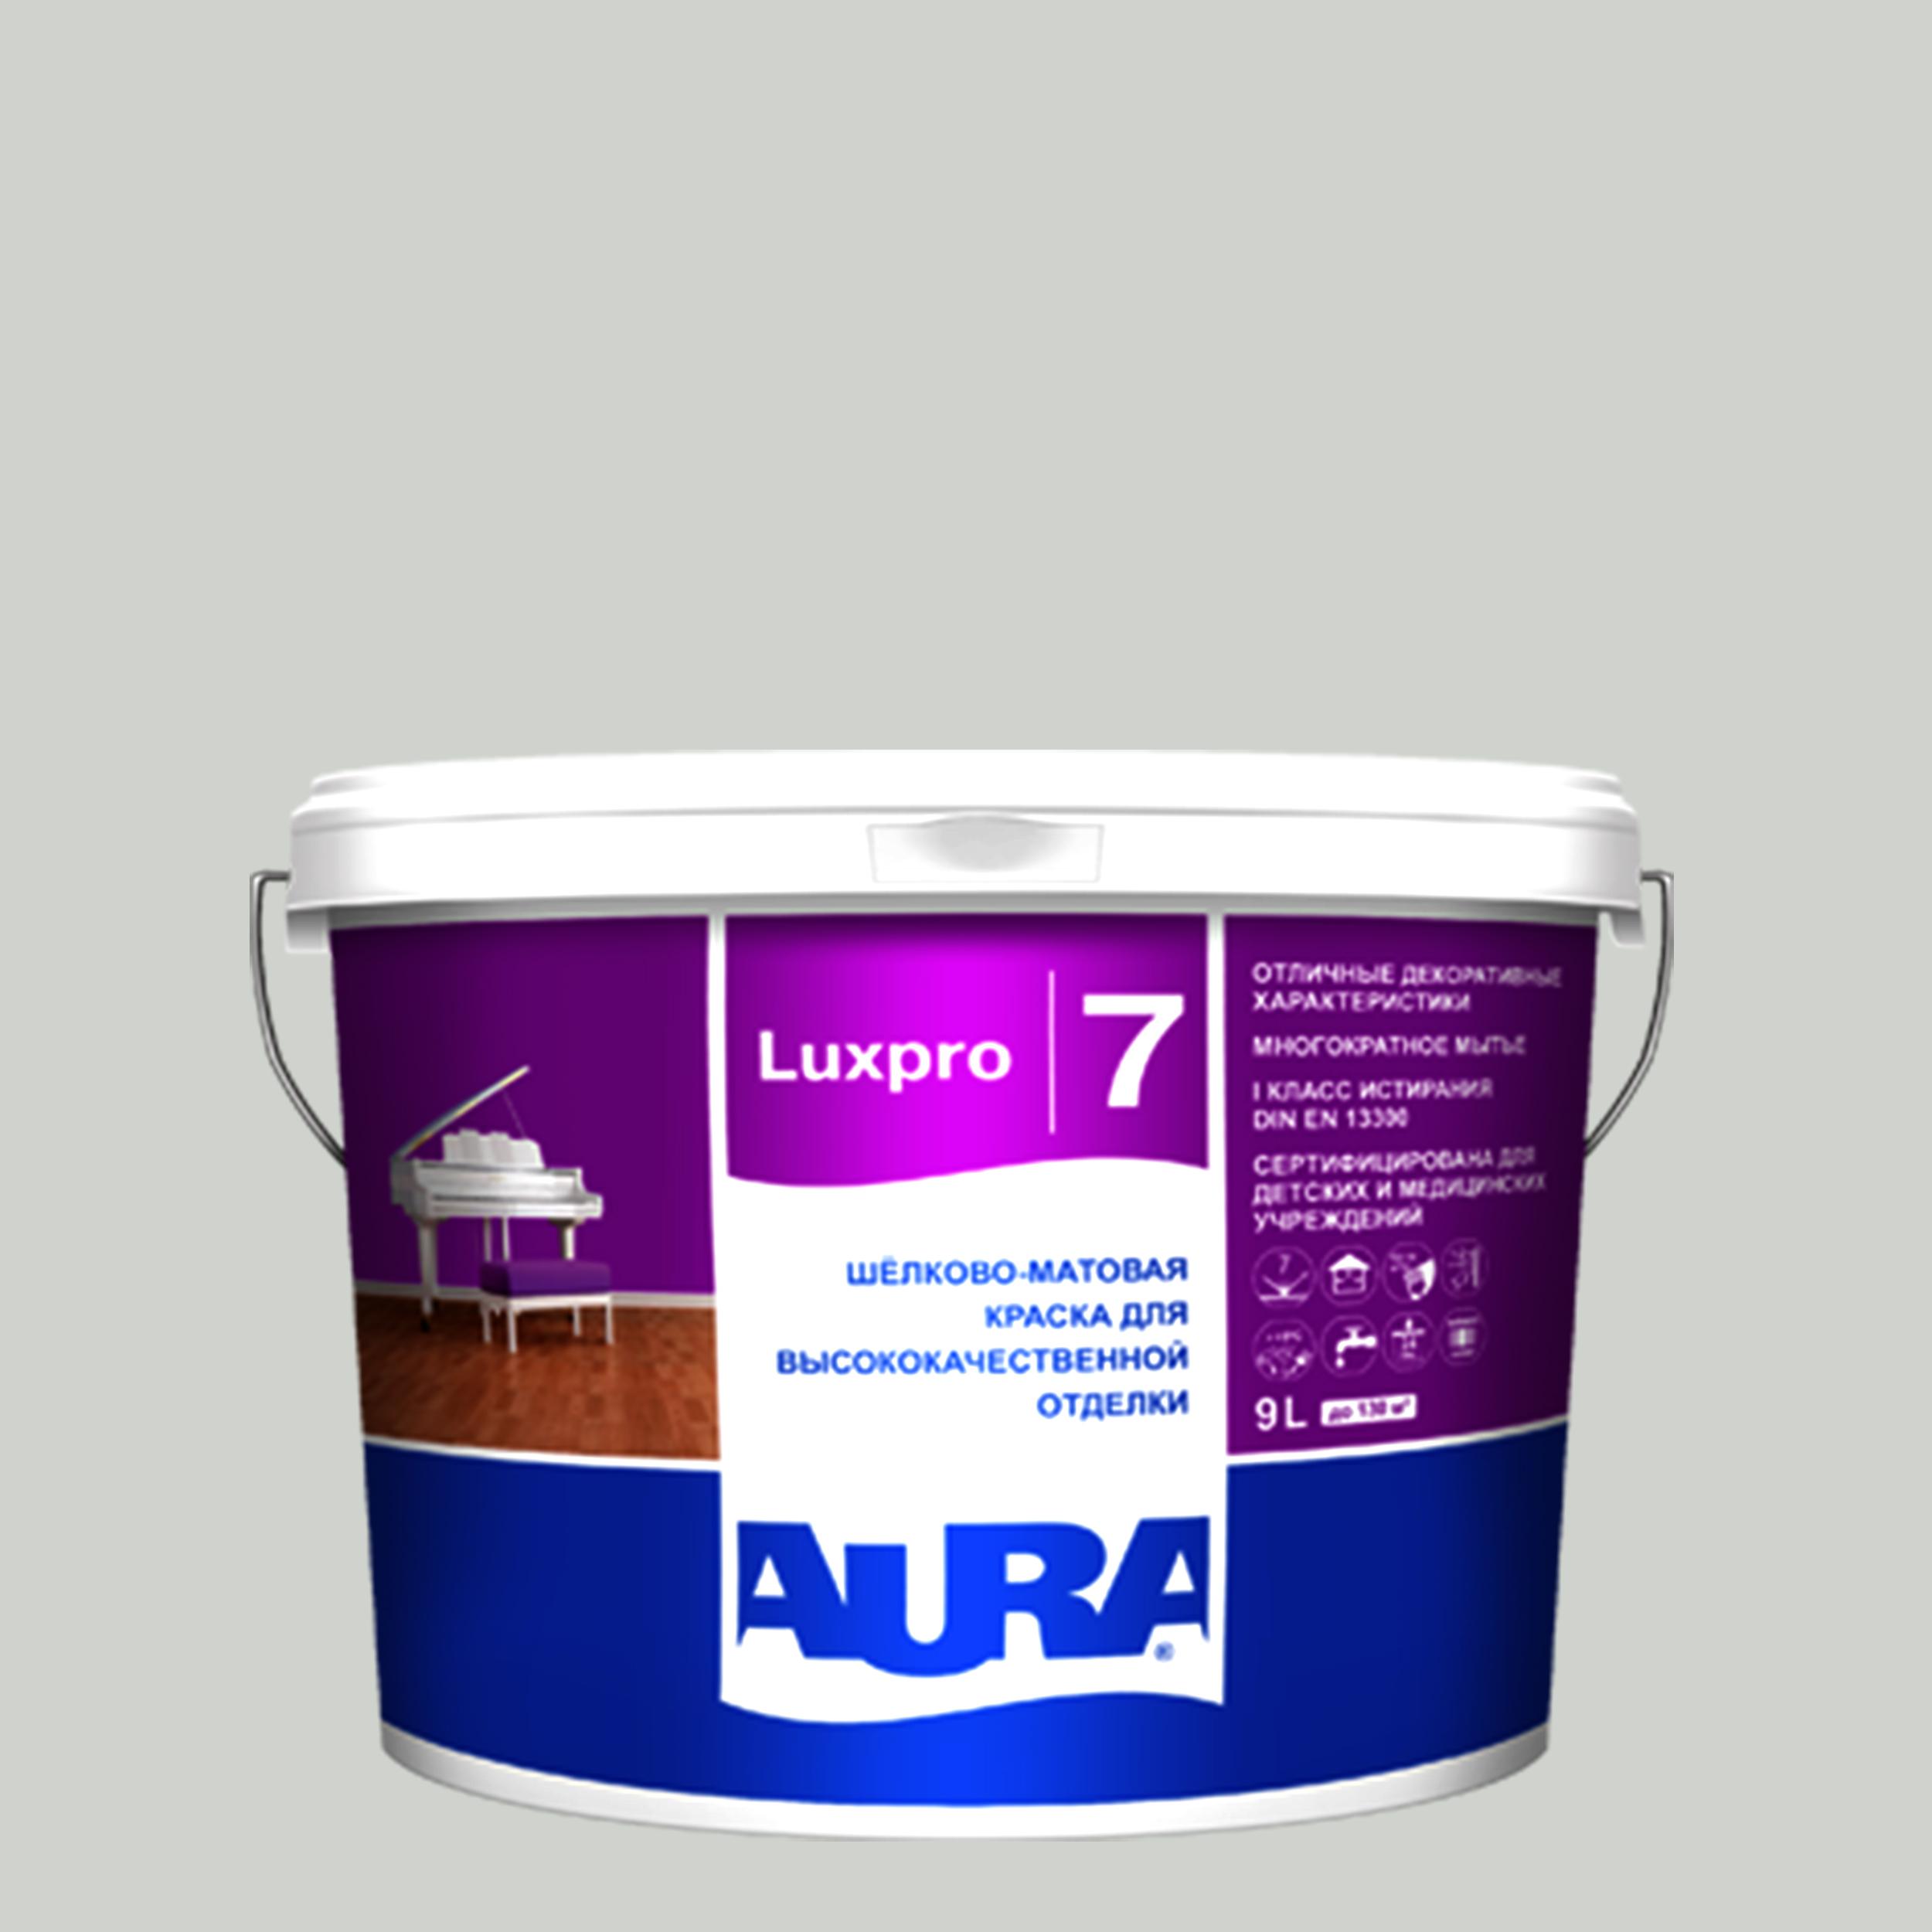 Фото 4 - Краска интерьерная, Aura LuxPRO 7, RAL 4001, 11 кг.